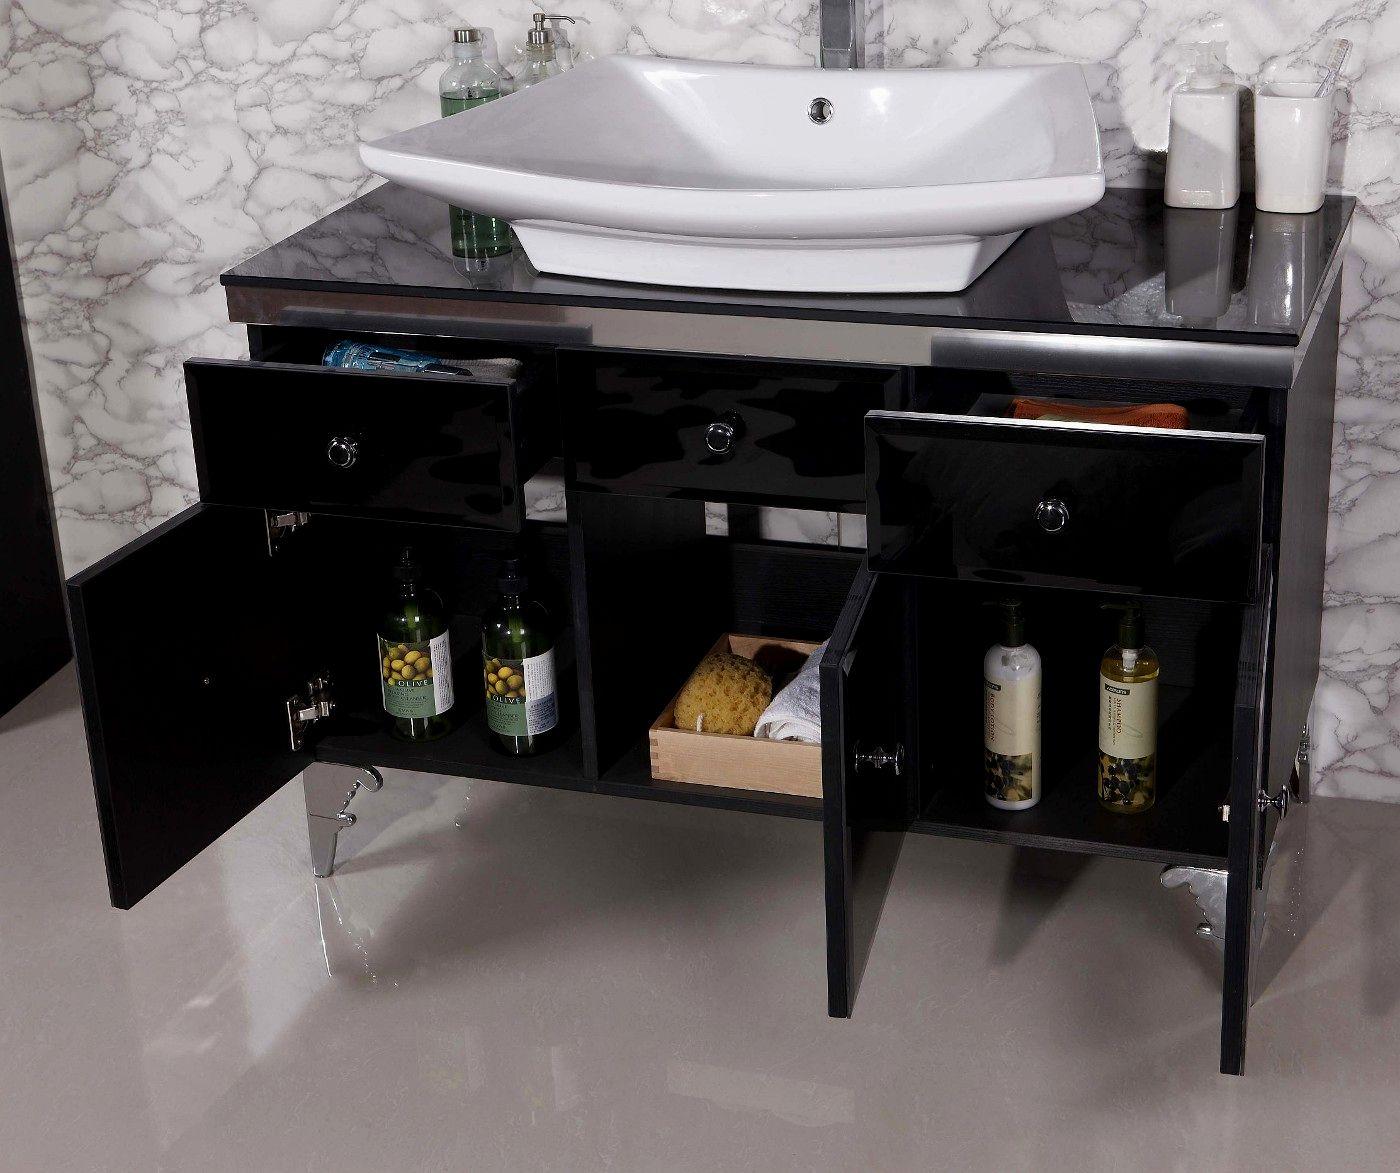 inspirational modern faucet bathroom model-Lovely Modern Faucet Bathroom Wallpaper